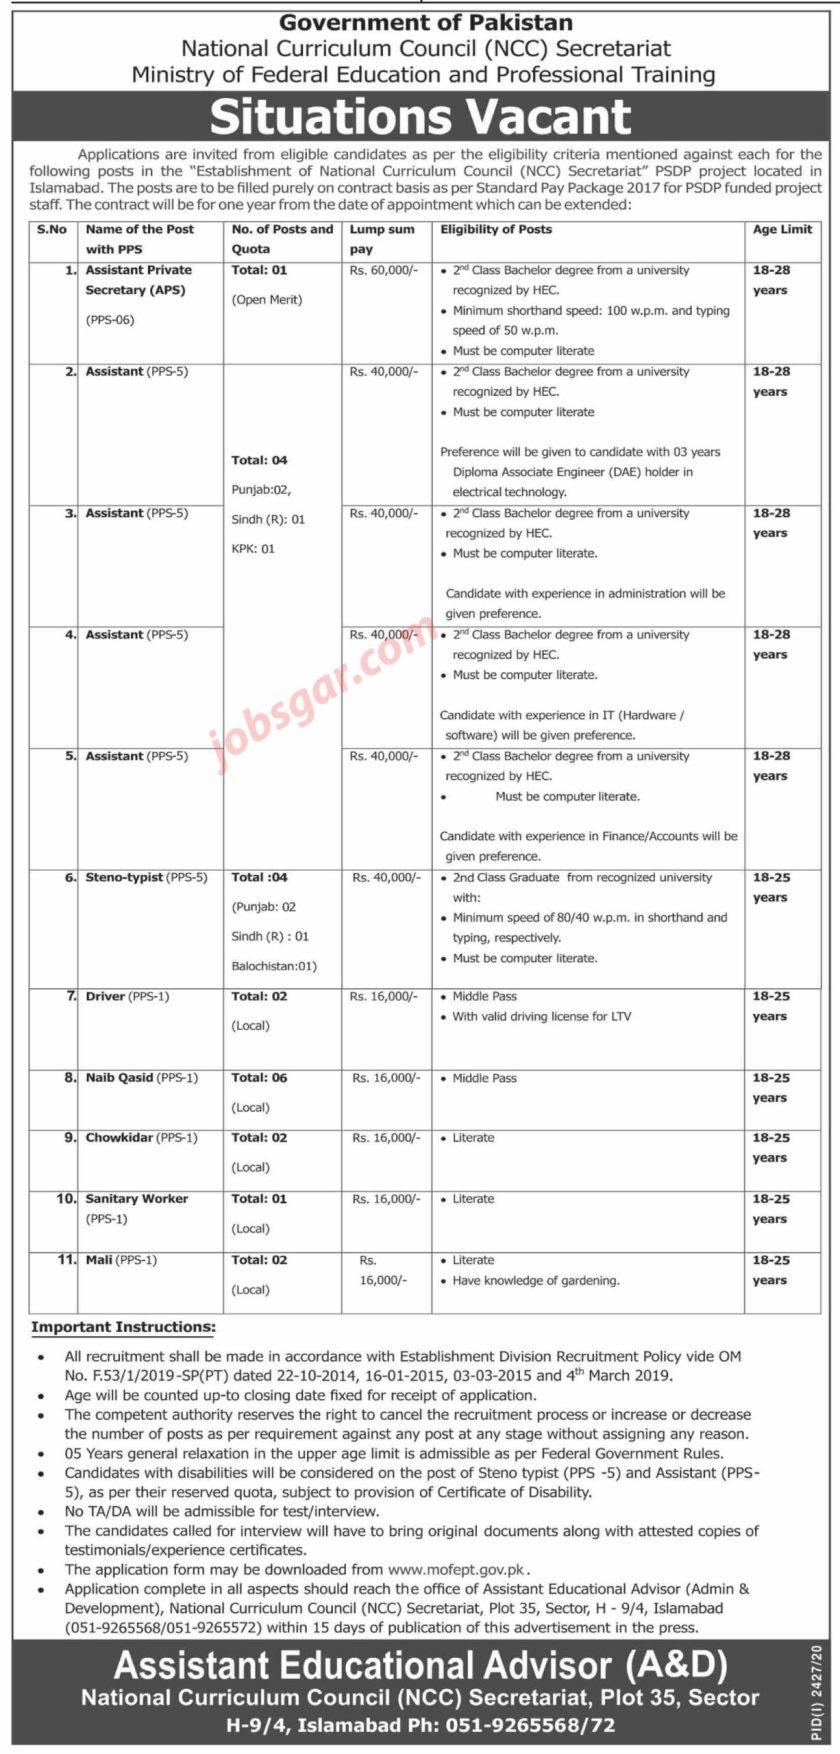 National Curriculum Council NCC Secretariat Islamabad Jobs 2020